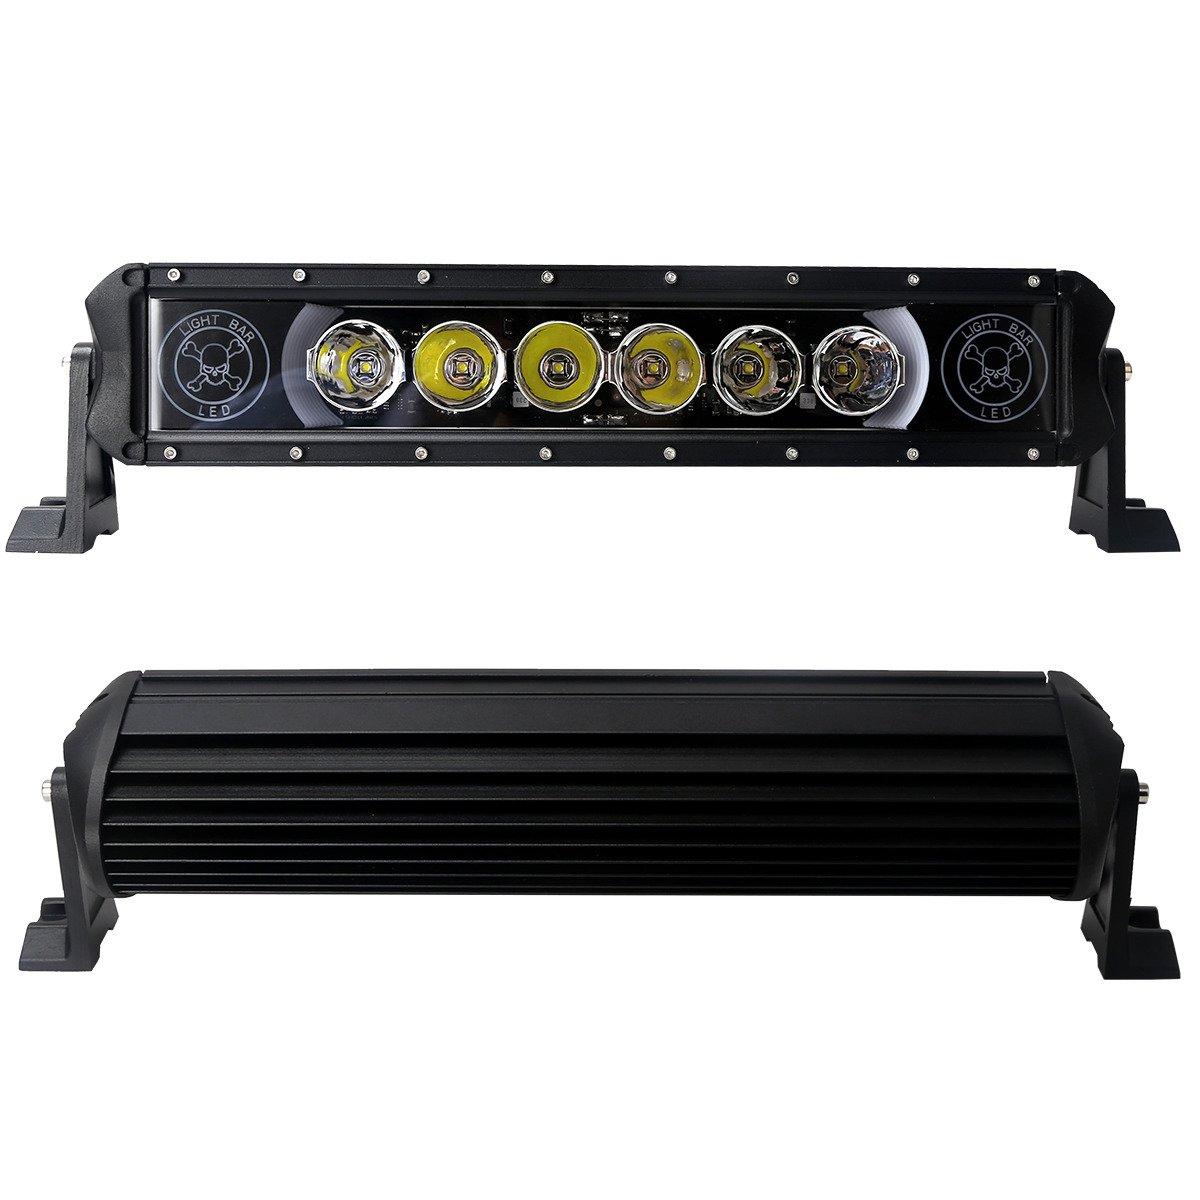 led work light bar 4x4 off road atv truck quad flood lamp 16 5 60w 6x 10w led lb i 60w drl. Black Bedroom Furniture Sets. Home Design Ideas